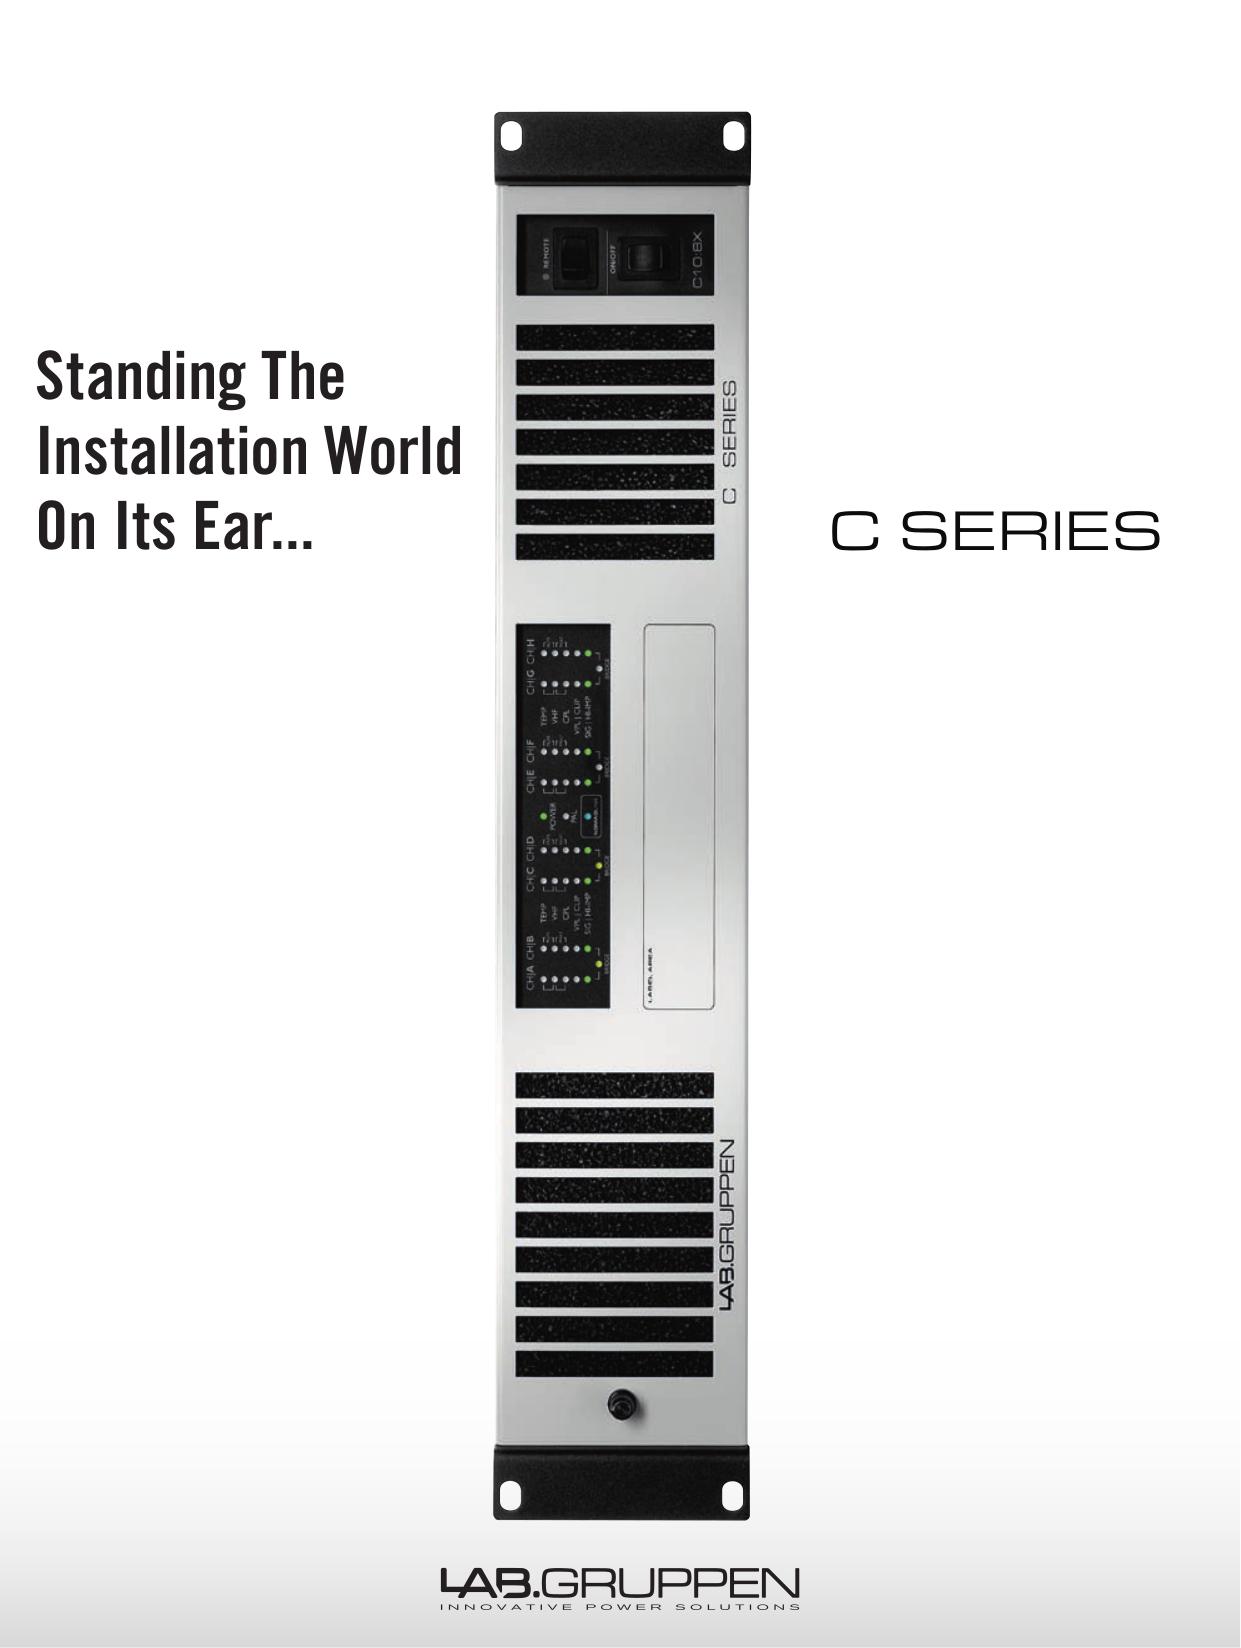 pdf for Lab.gruppen Amp C Series C 10 4X manual